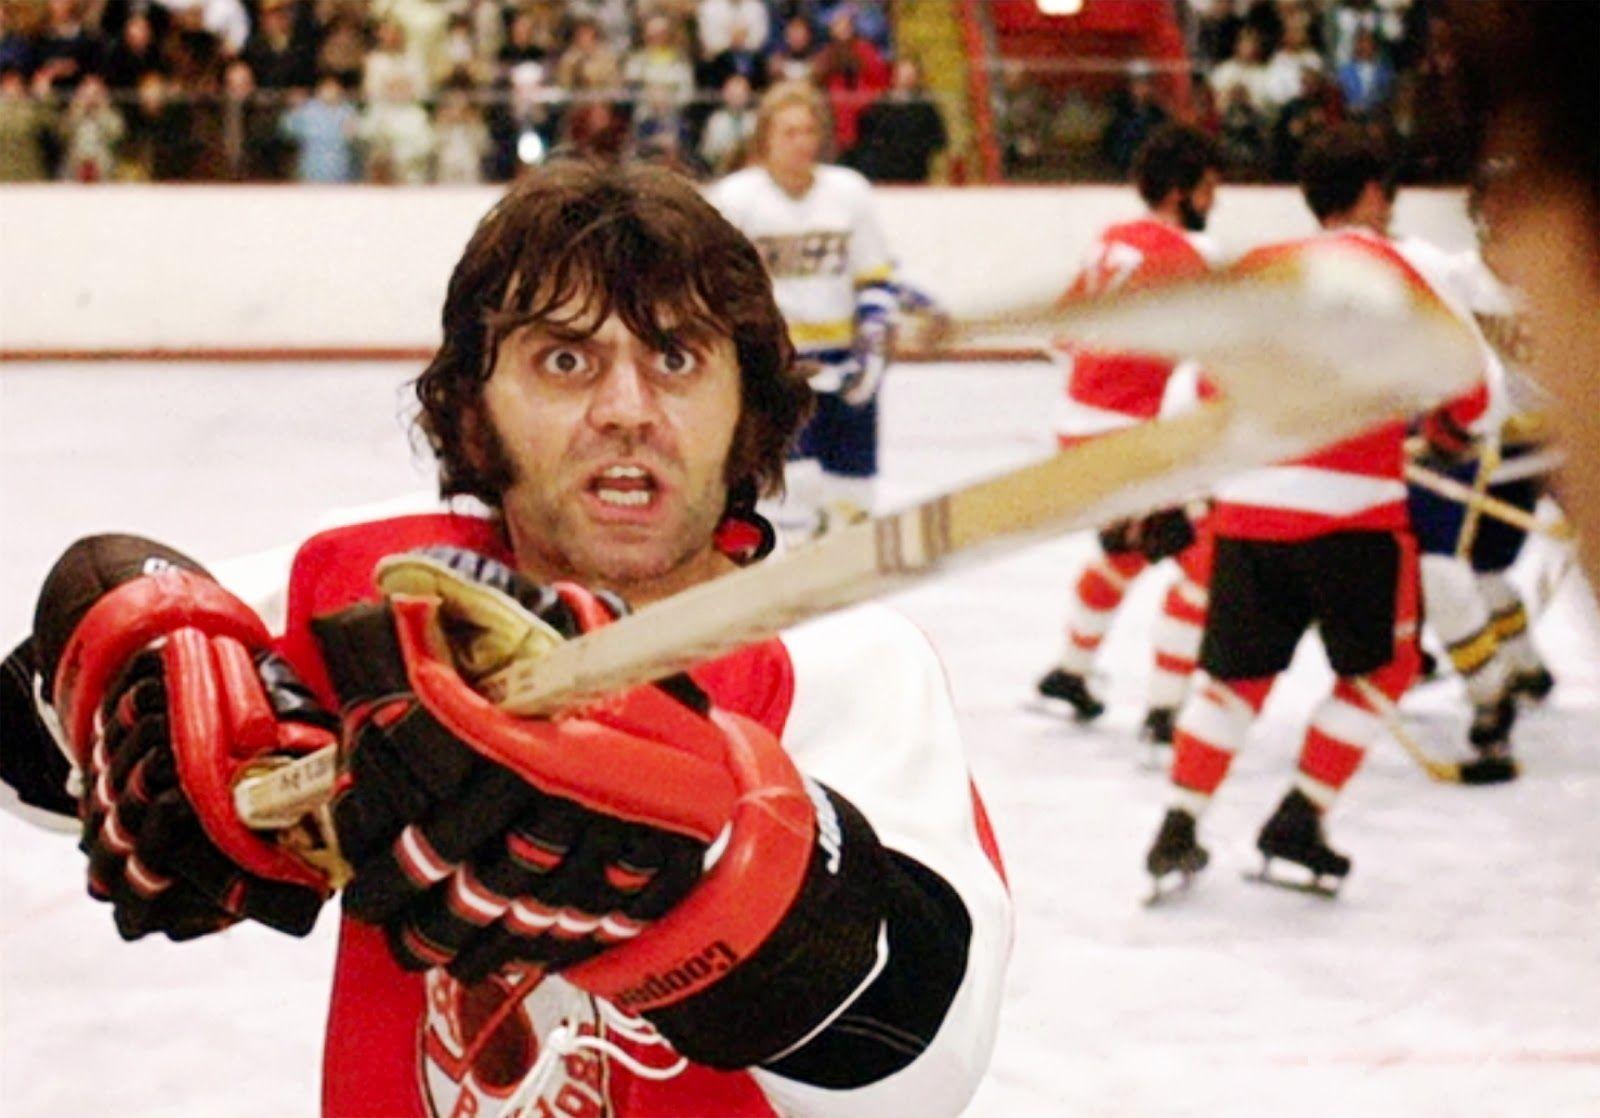 High Sticking Chiefs Clothing Brand Based On A Defunct Legendary Minor League Hockey Team Their Motto Was Spe Hockey Training Slap Shot Slap Shot Movie